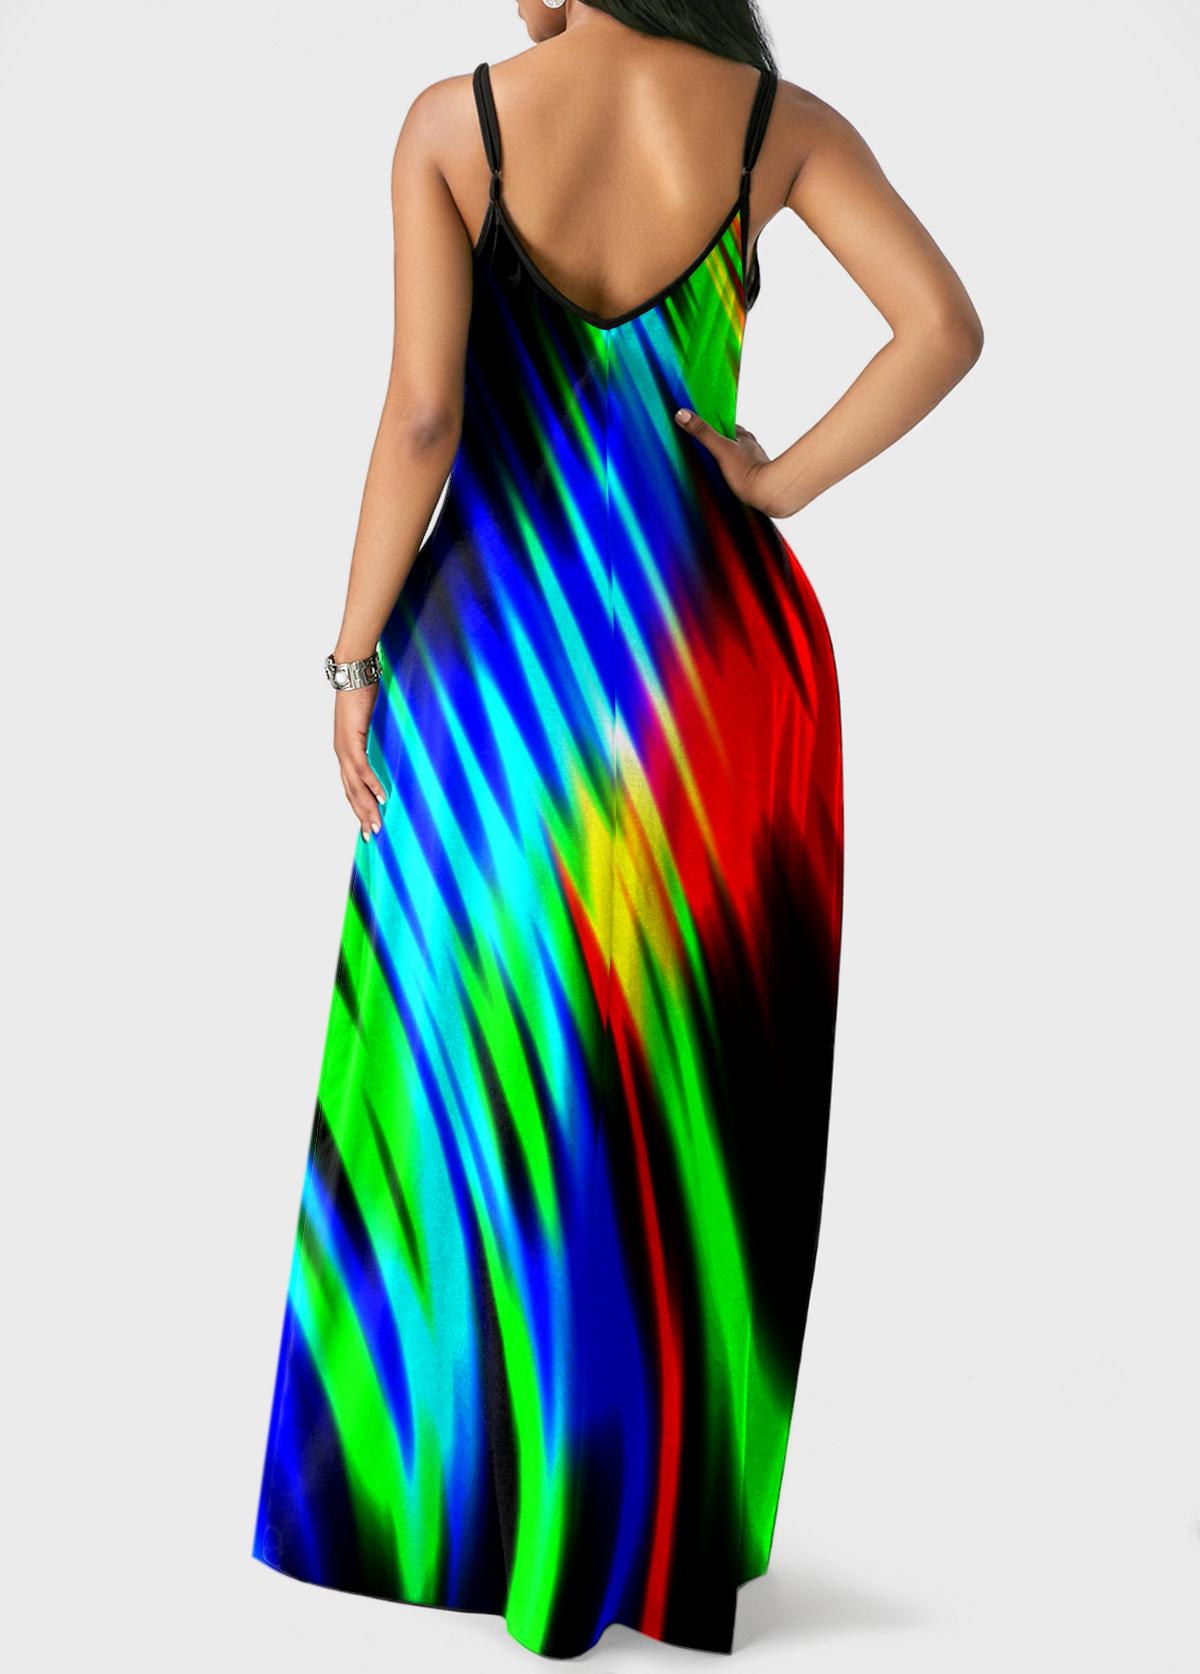 Pocket Colorful Printed Spaghetti Strap Dress